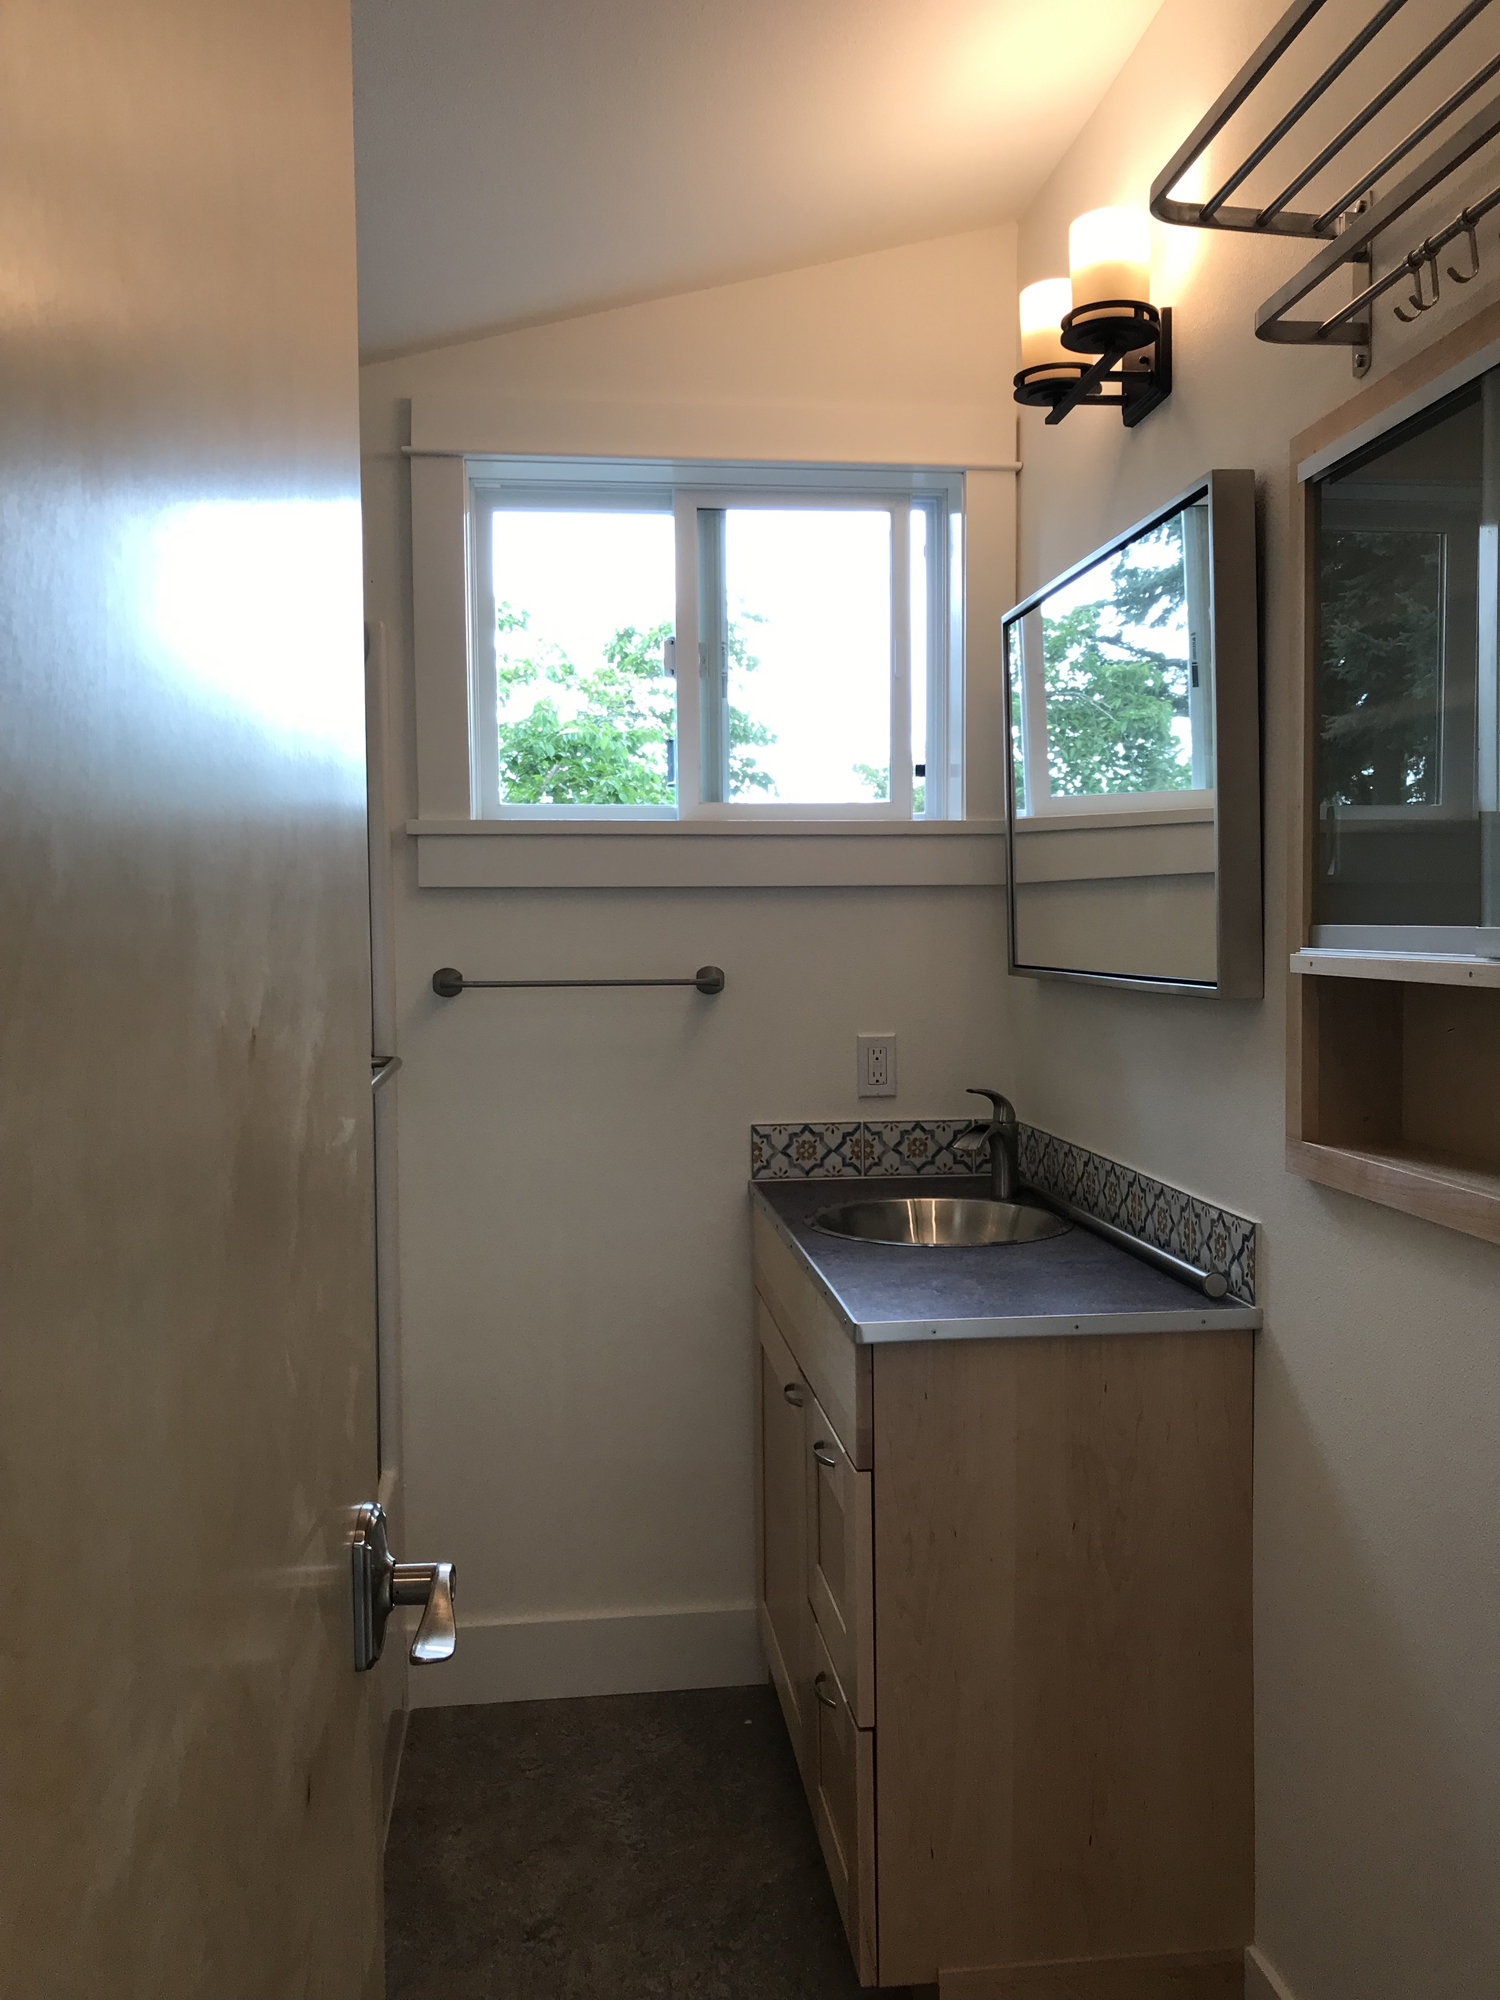 Bathroom cabinet/sink area.